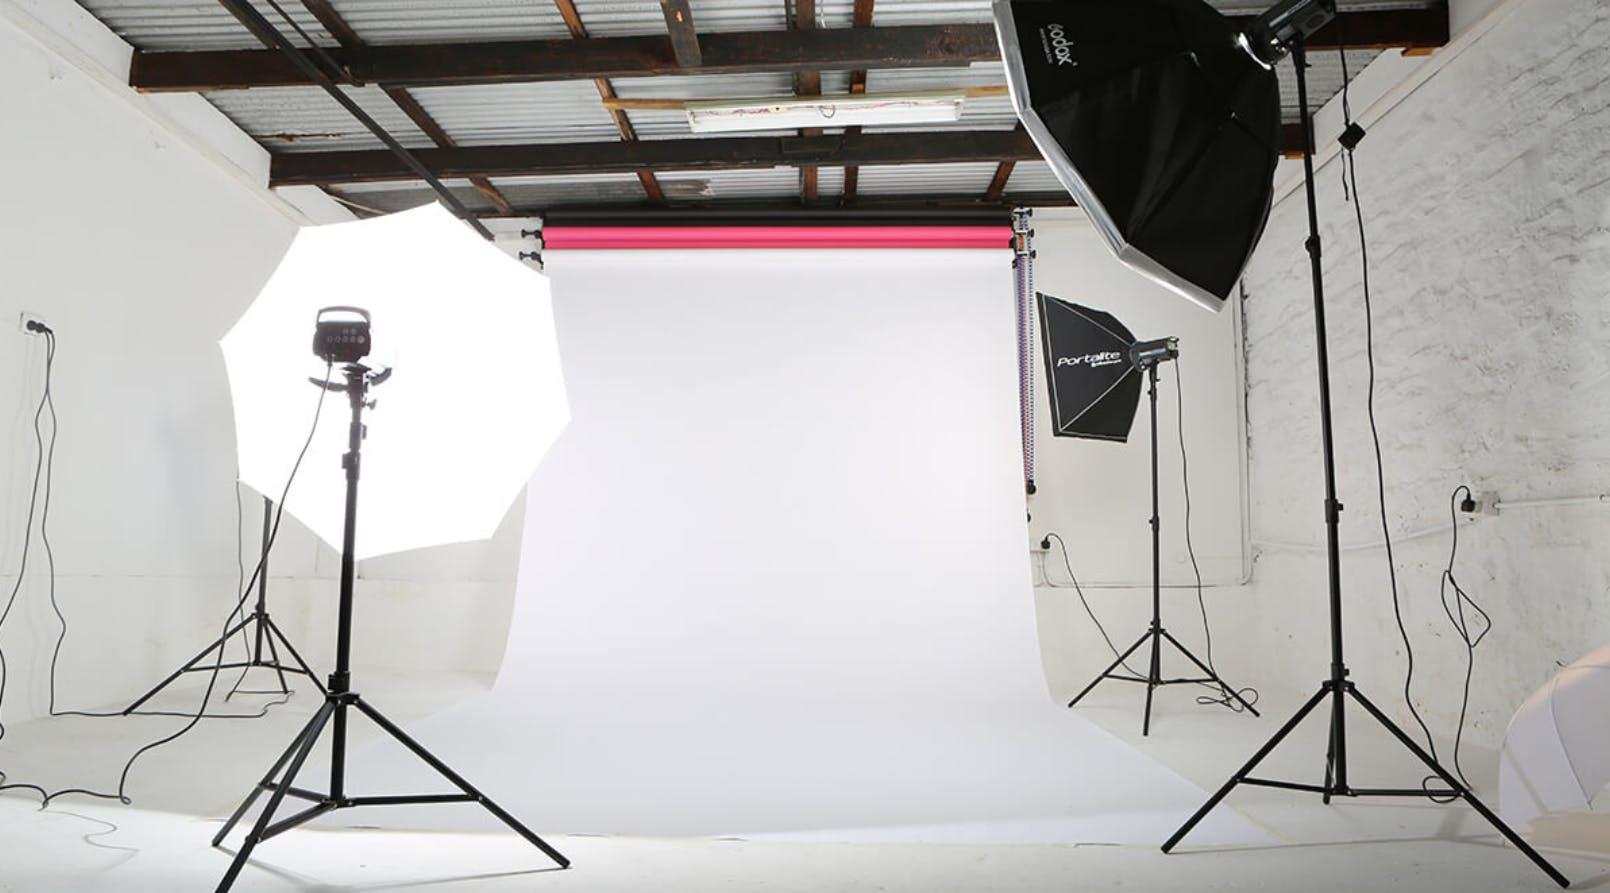 Photography Studio or, creative studio at MULLENS ST. STUDIO, image 1